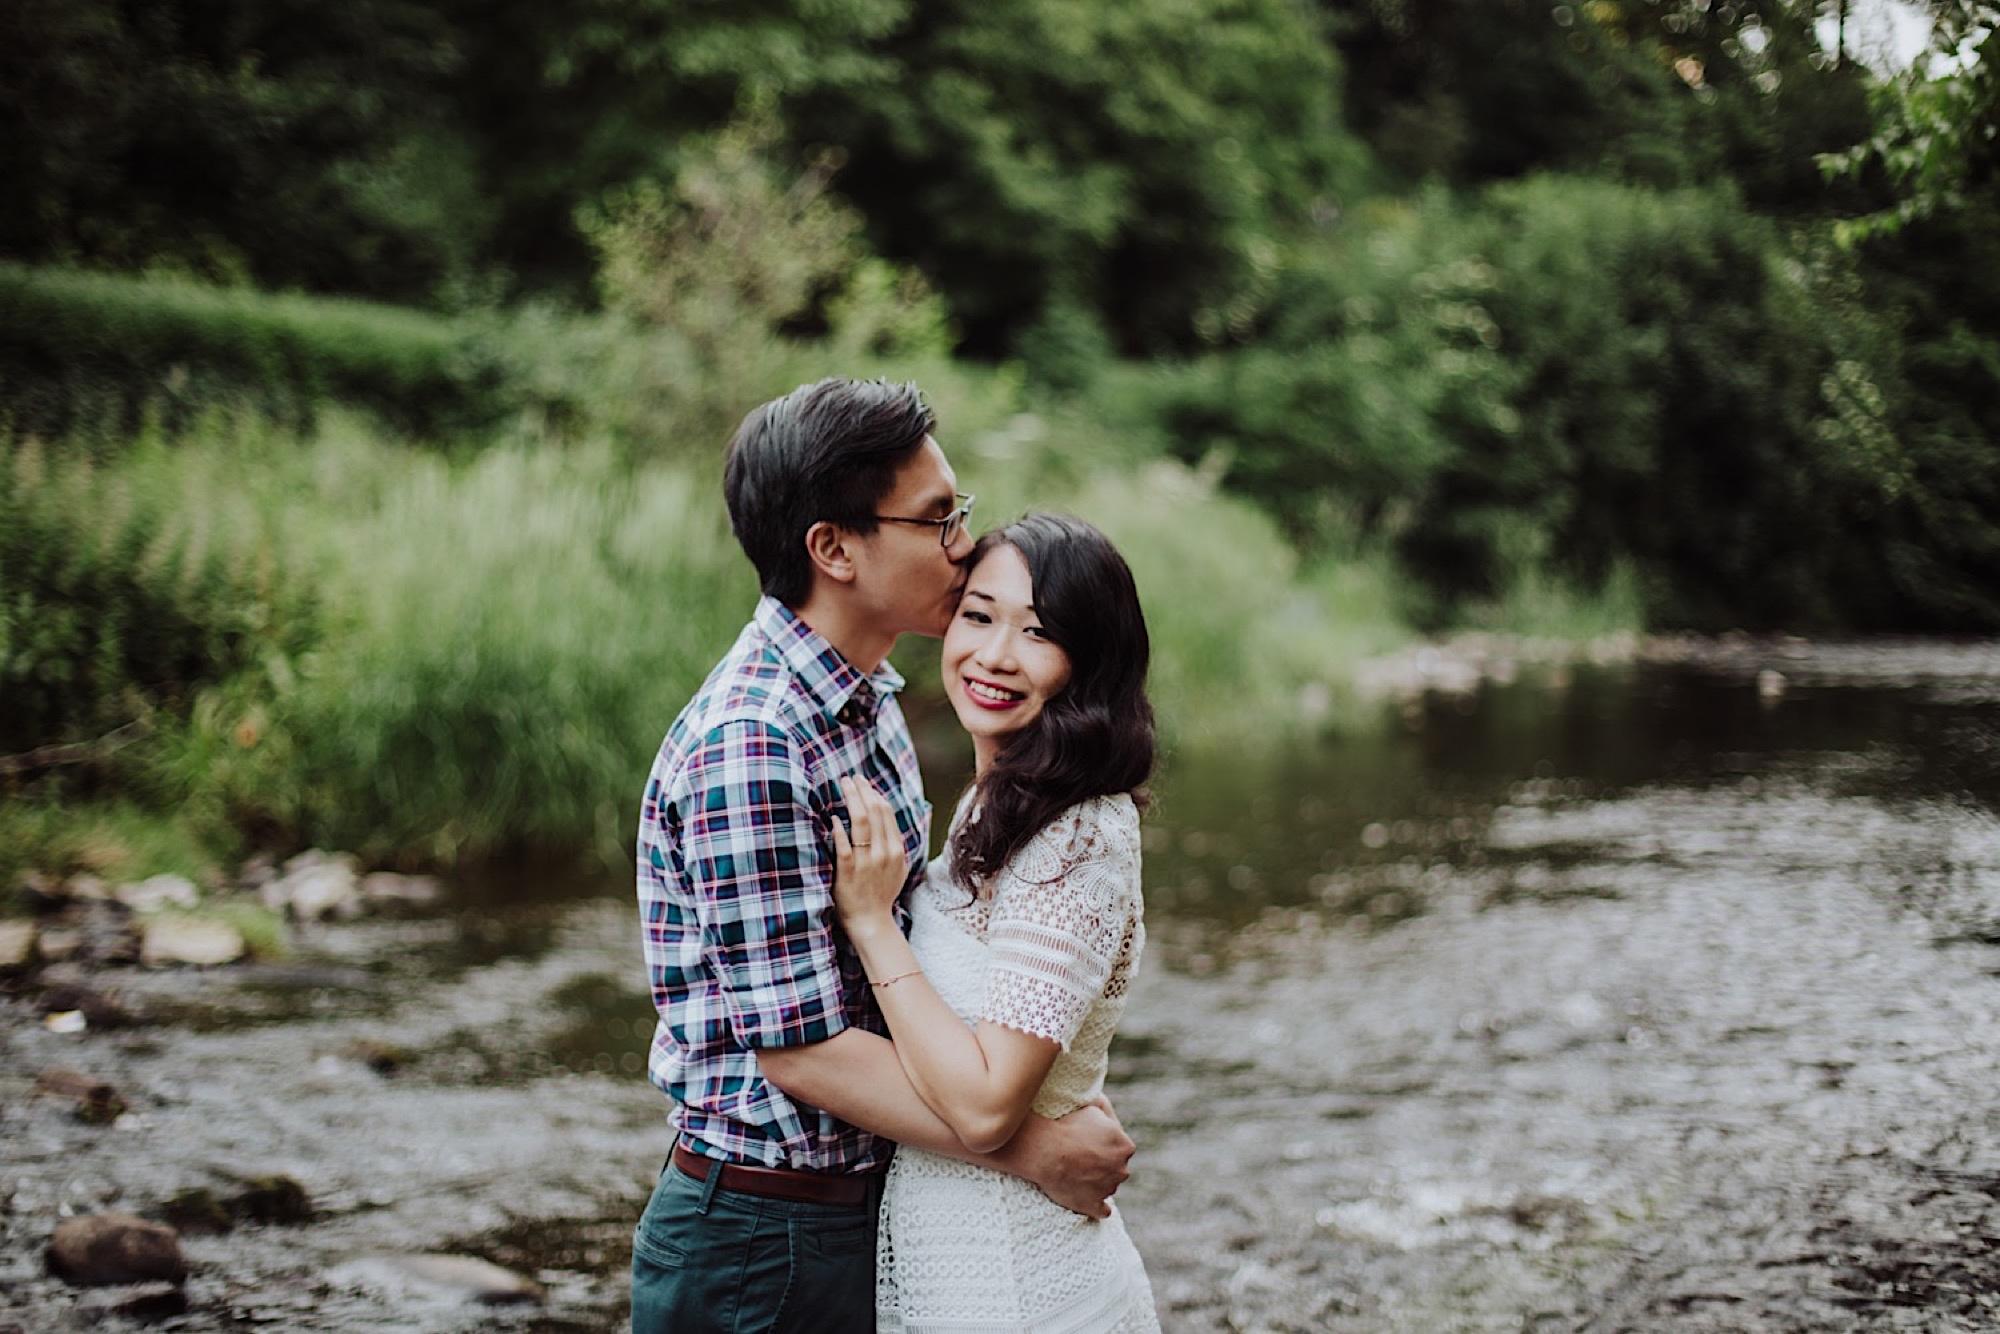 dean villiage edinburgh couple photoshoot